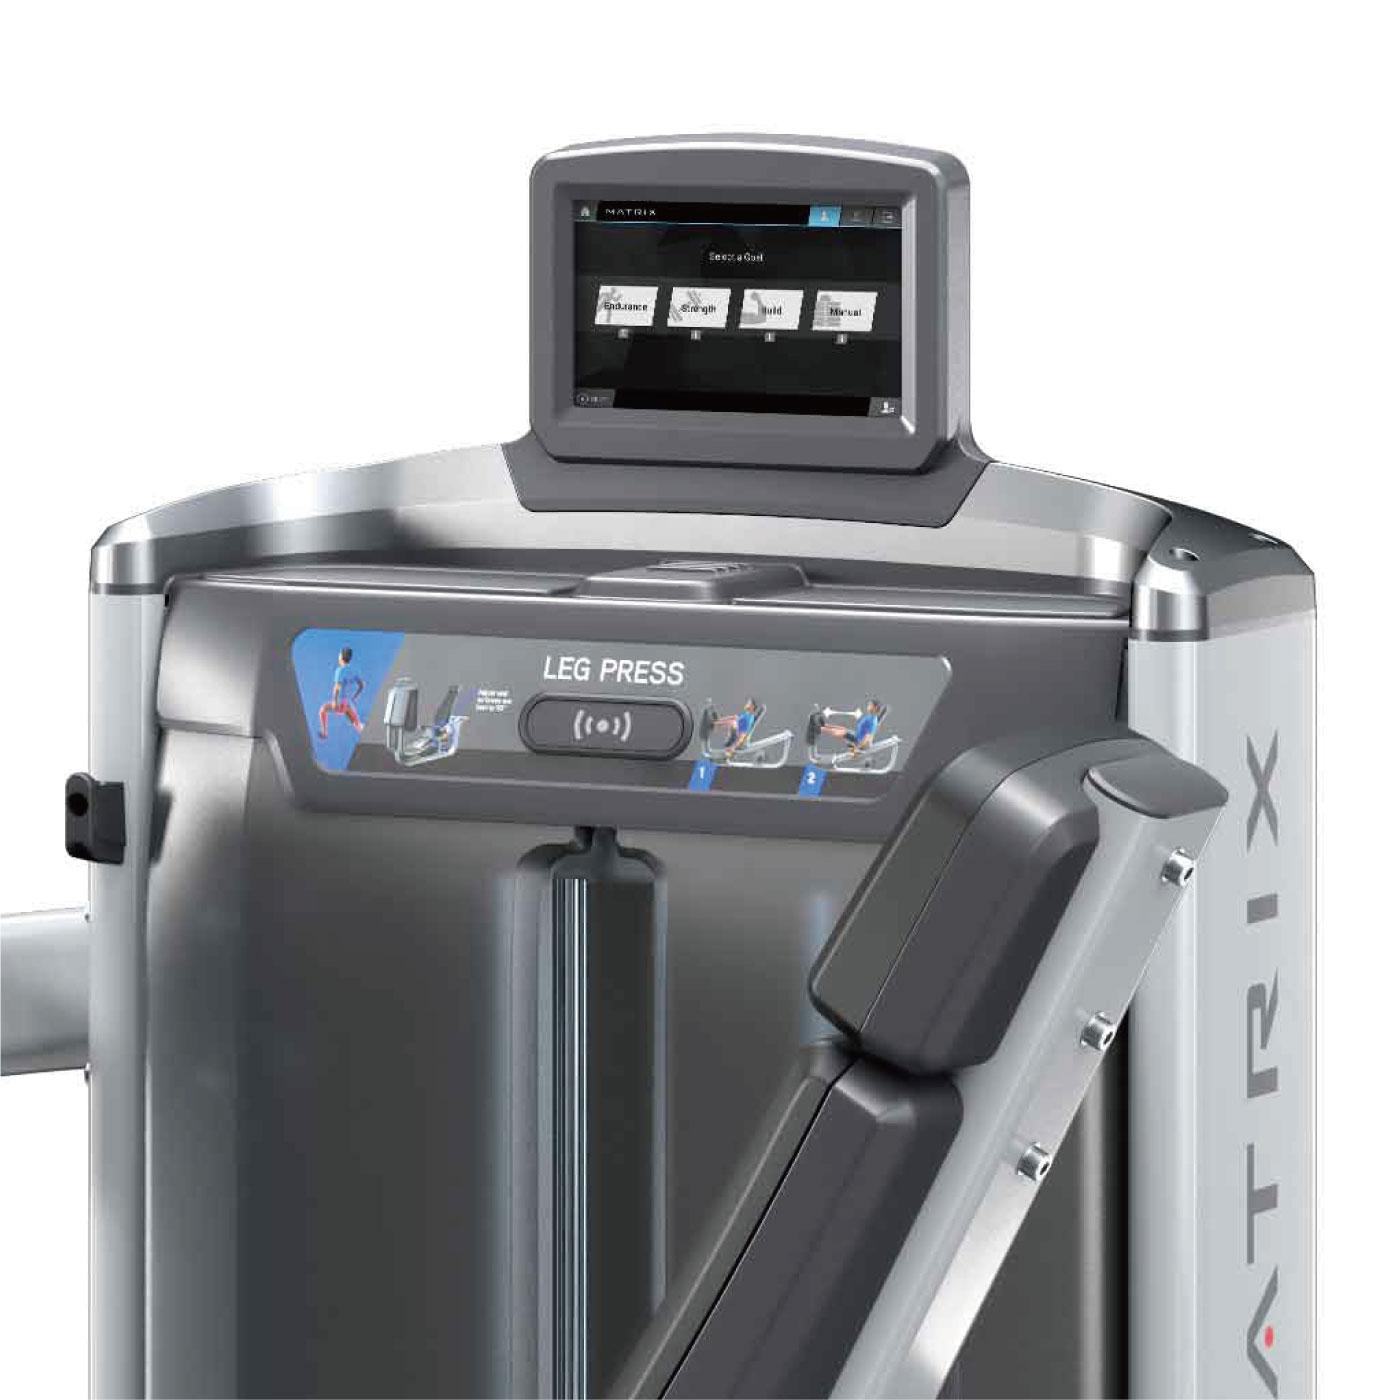 G7-S70-V2(レッグプレス)〈アルトラV2シリーズ〉/業務用ストレングスマシン〈業務用MATRIX〉《ジョンソンヘルステック》